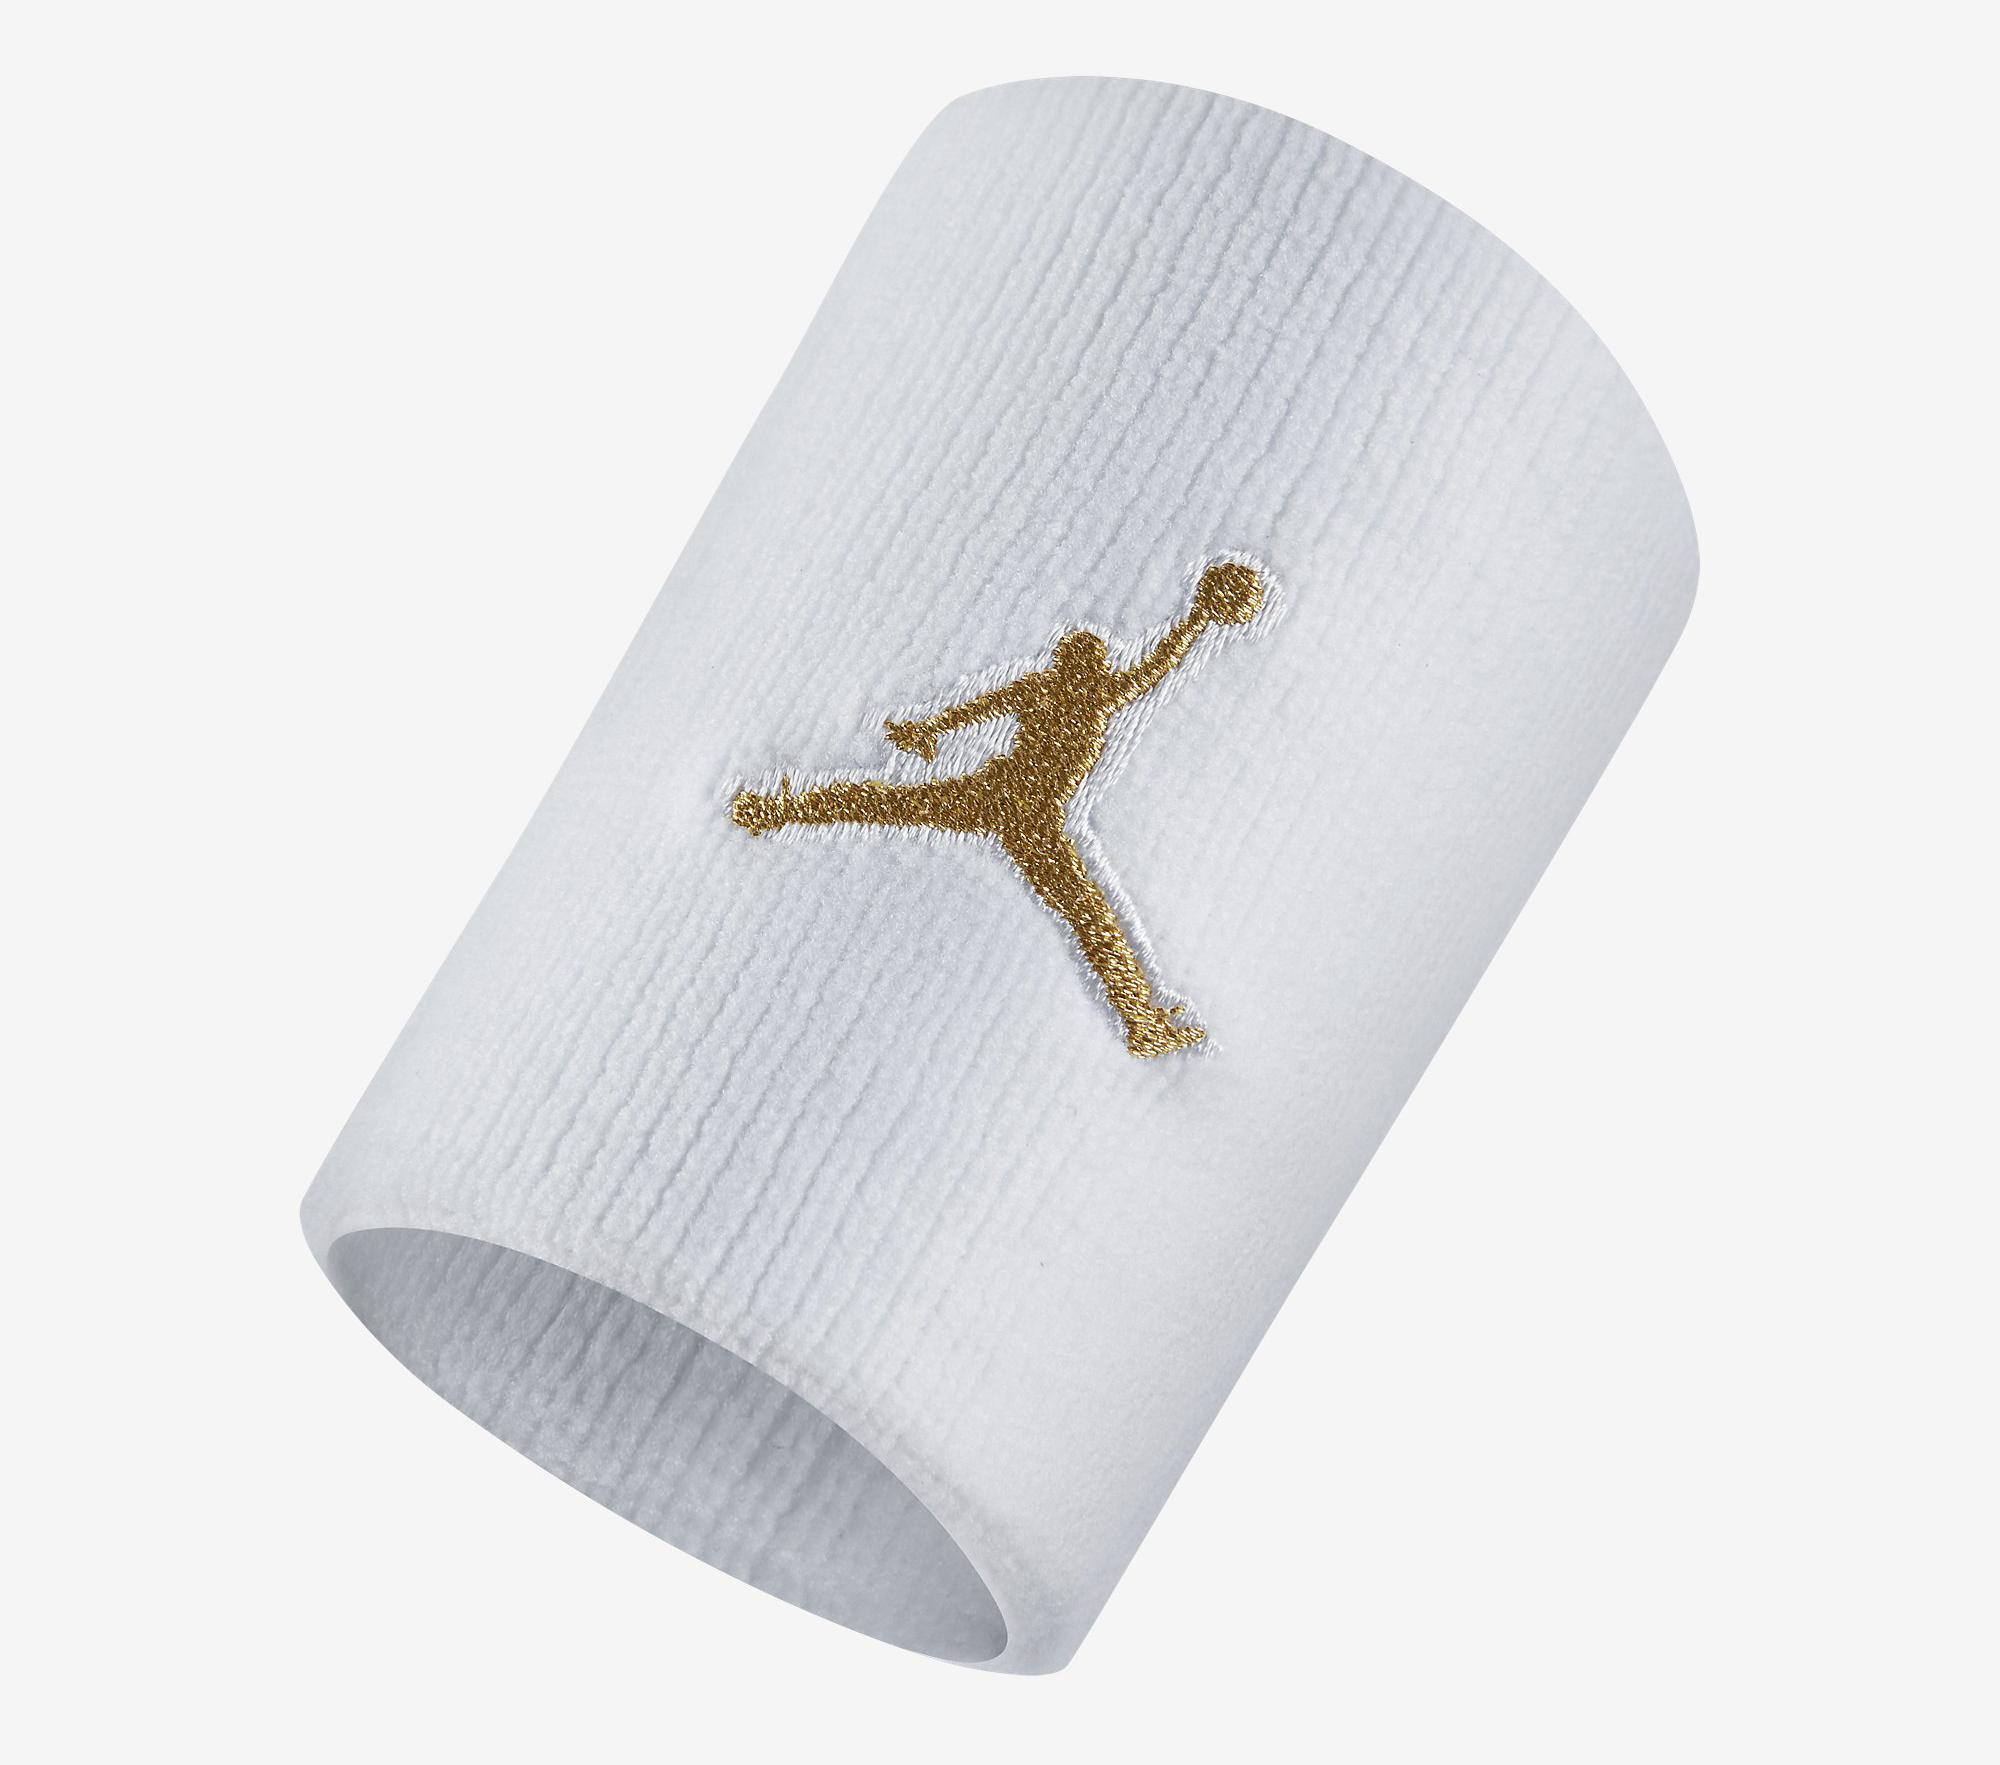 Drake OVO Air Jordan Wristband